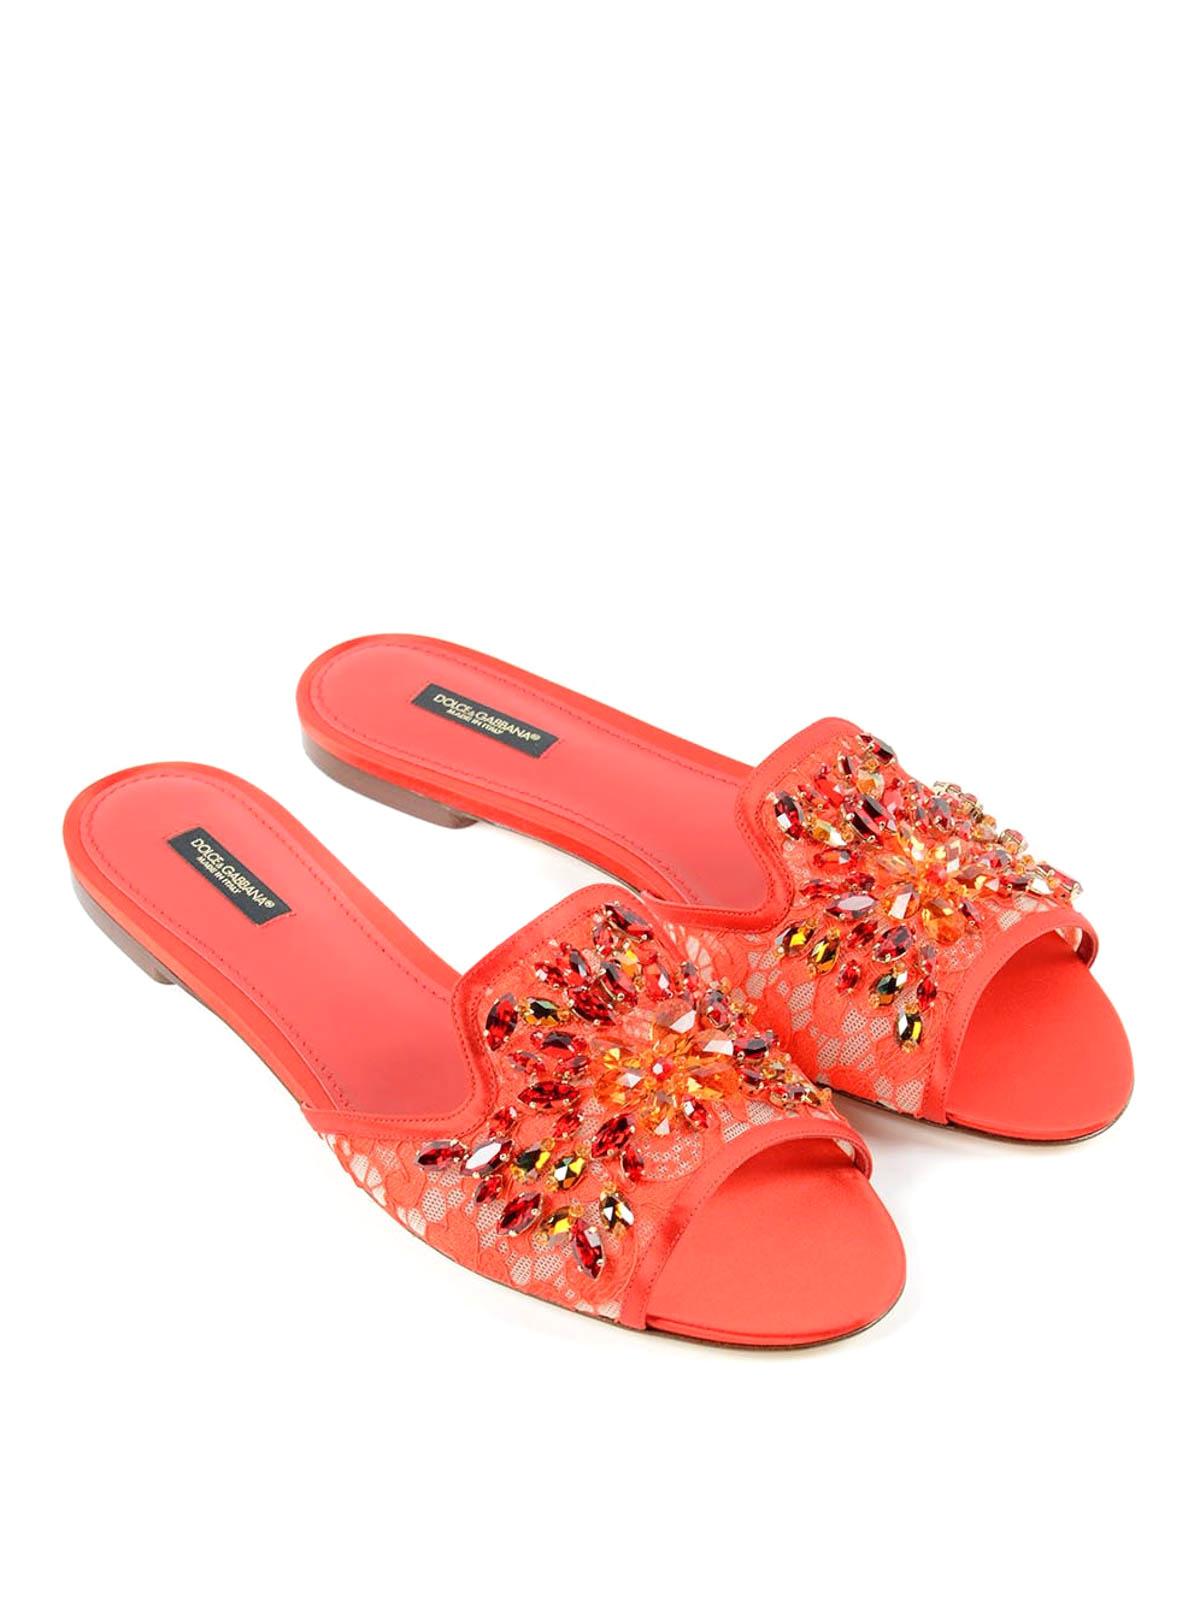 Dolce & Gabbana original sandali/ sandals